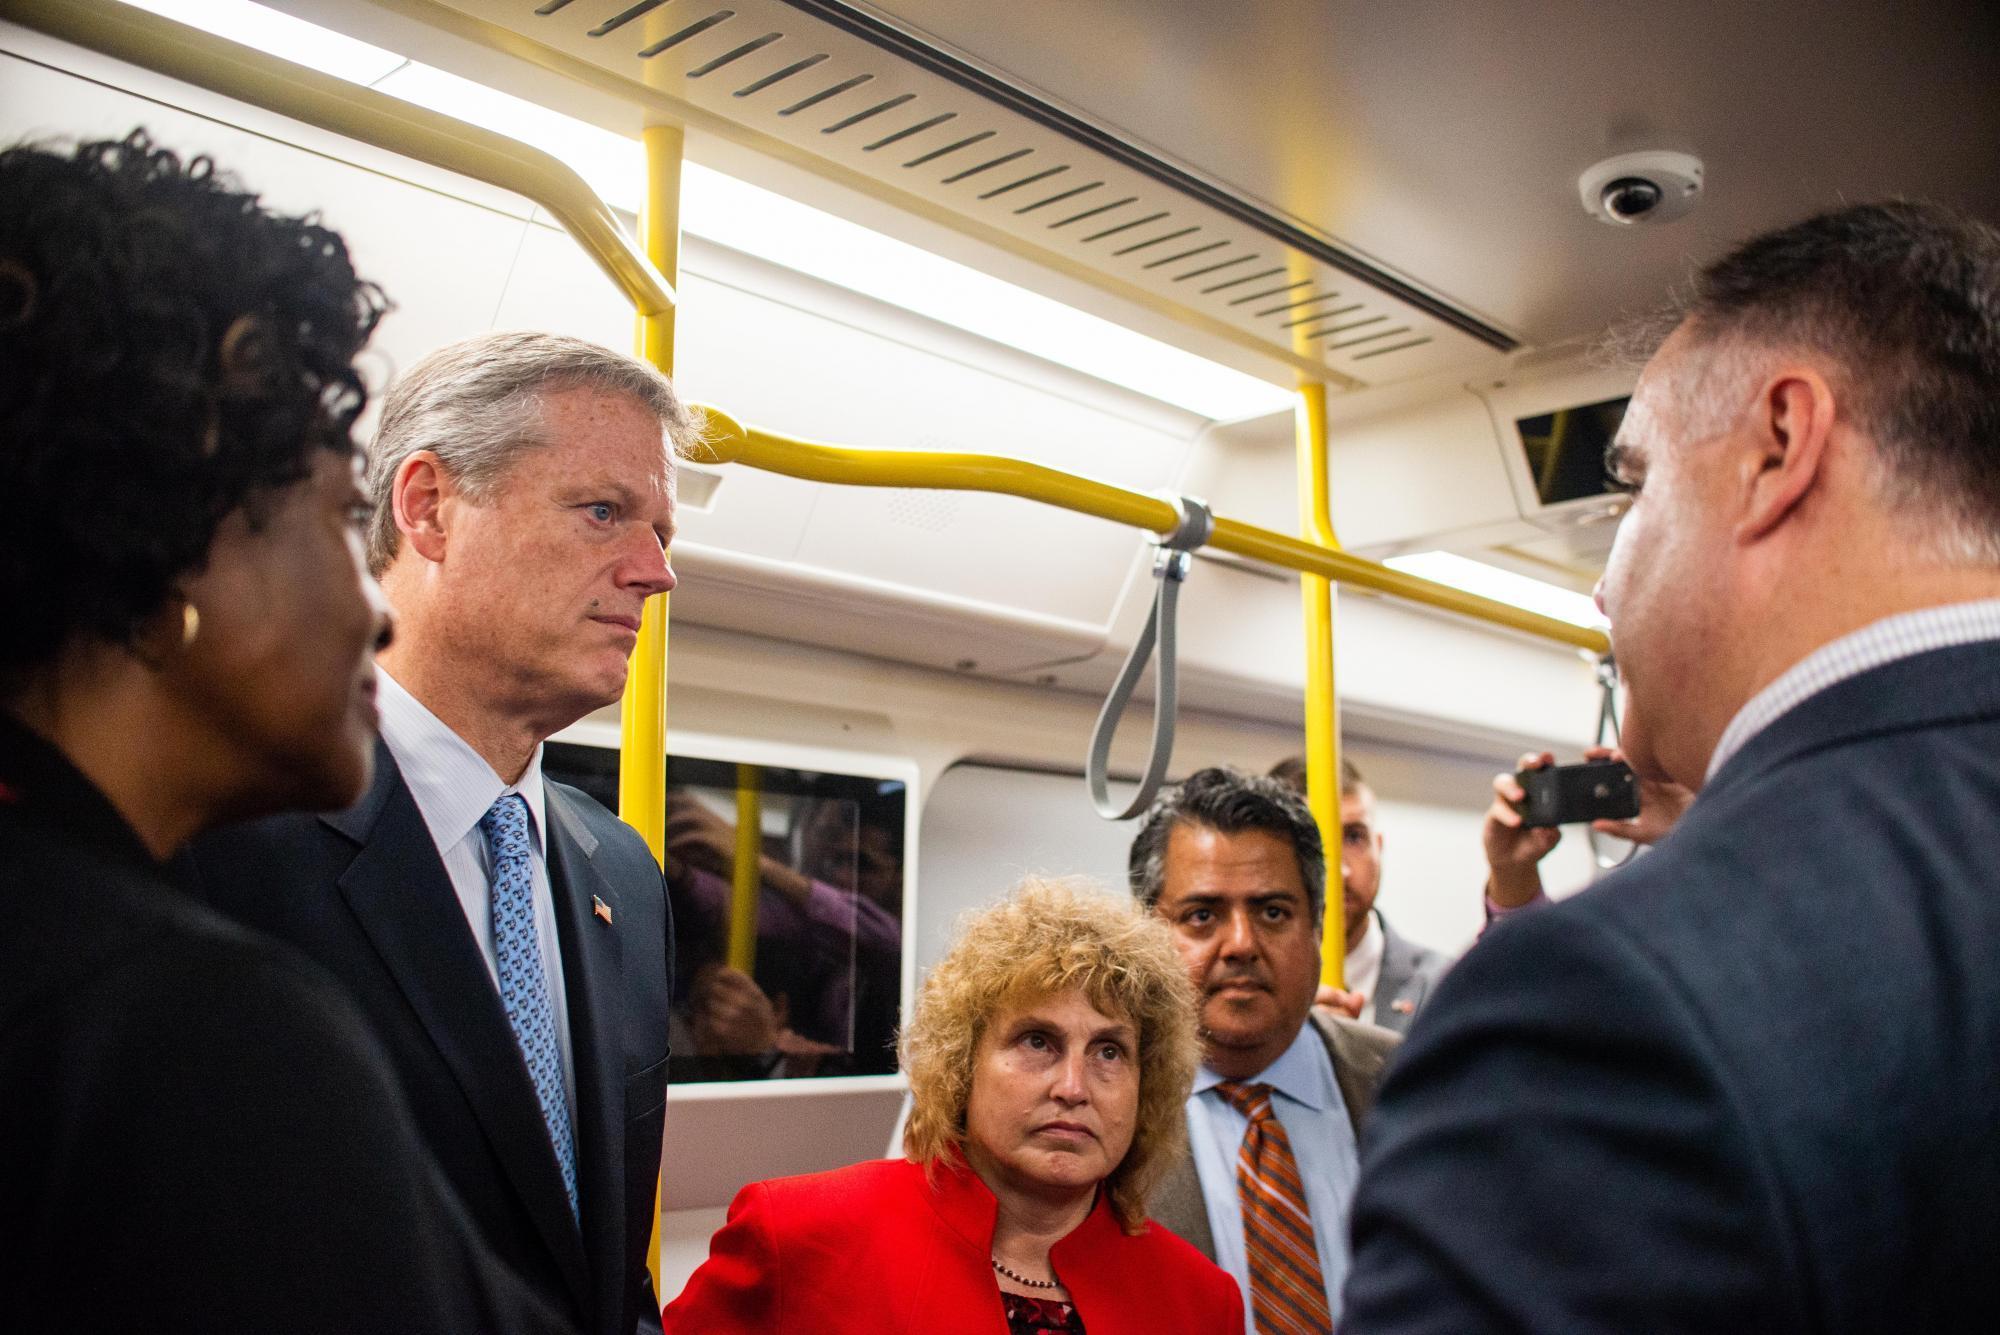 Governor Charlie Baker, Transportation Secretary Stephanie Pollack, and MBTA General Manager Luis Ramirez inside the Red Line mock-up car.